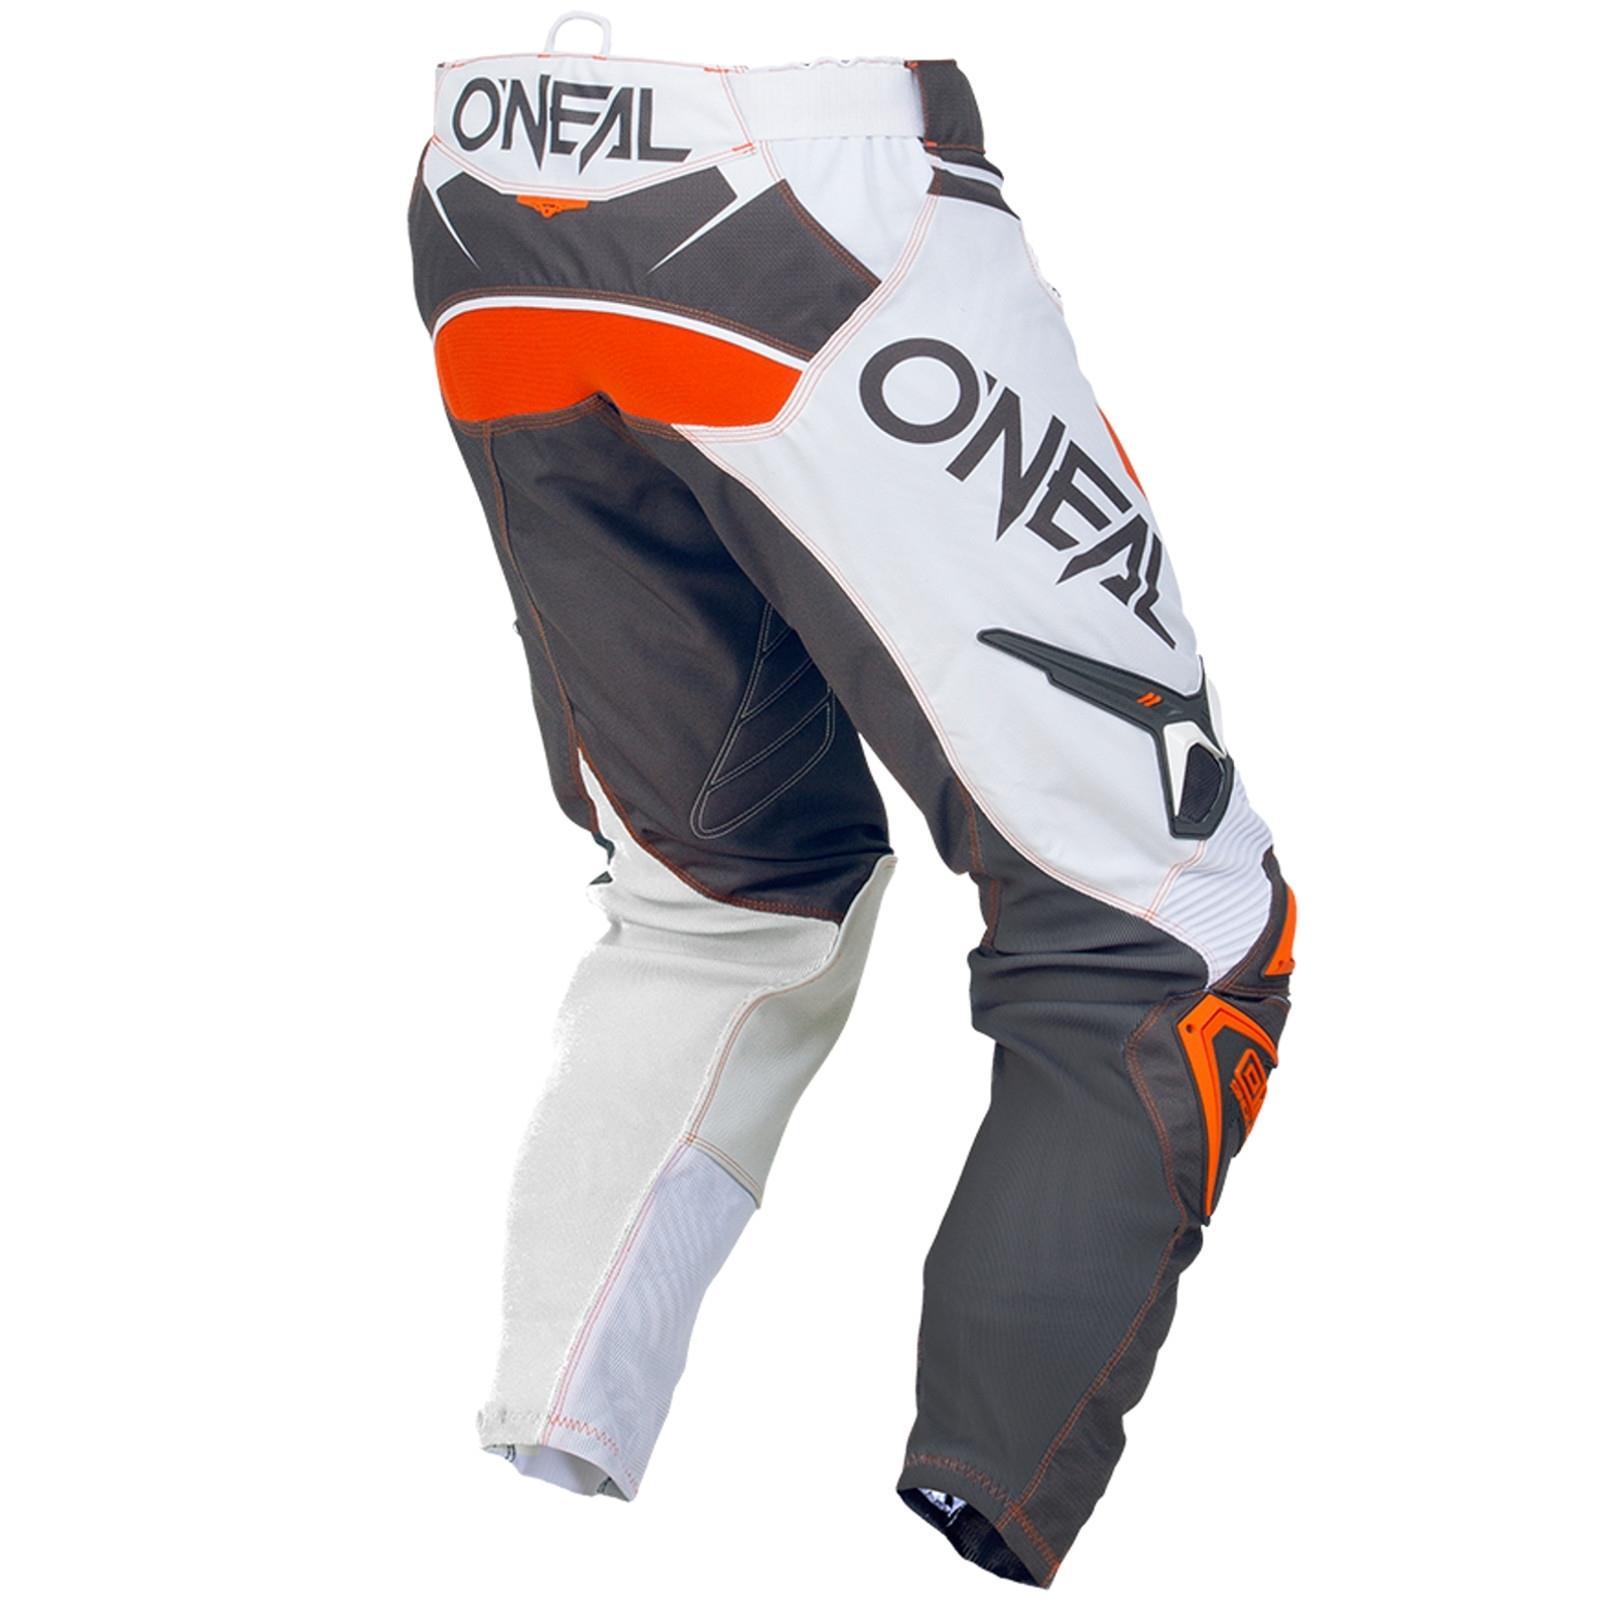 Oneal-elemento-Mayhem-Hardwear-Pants-pantalones-MX-DH-FR-Moto-Cross-Enduro-MTB-moto miniatura 14